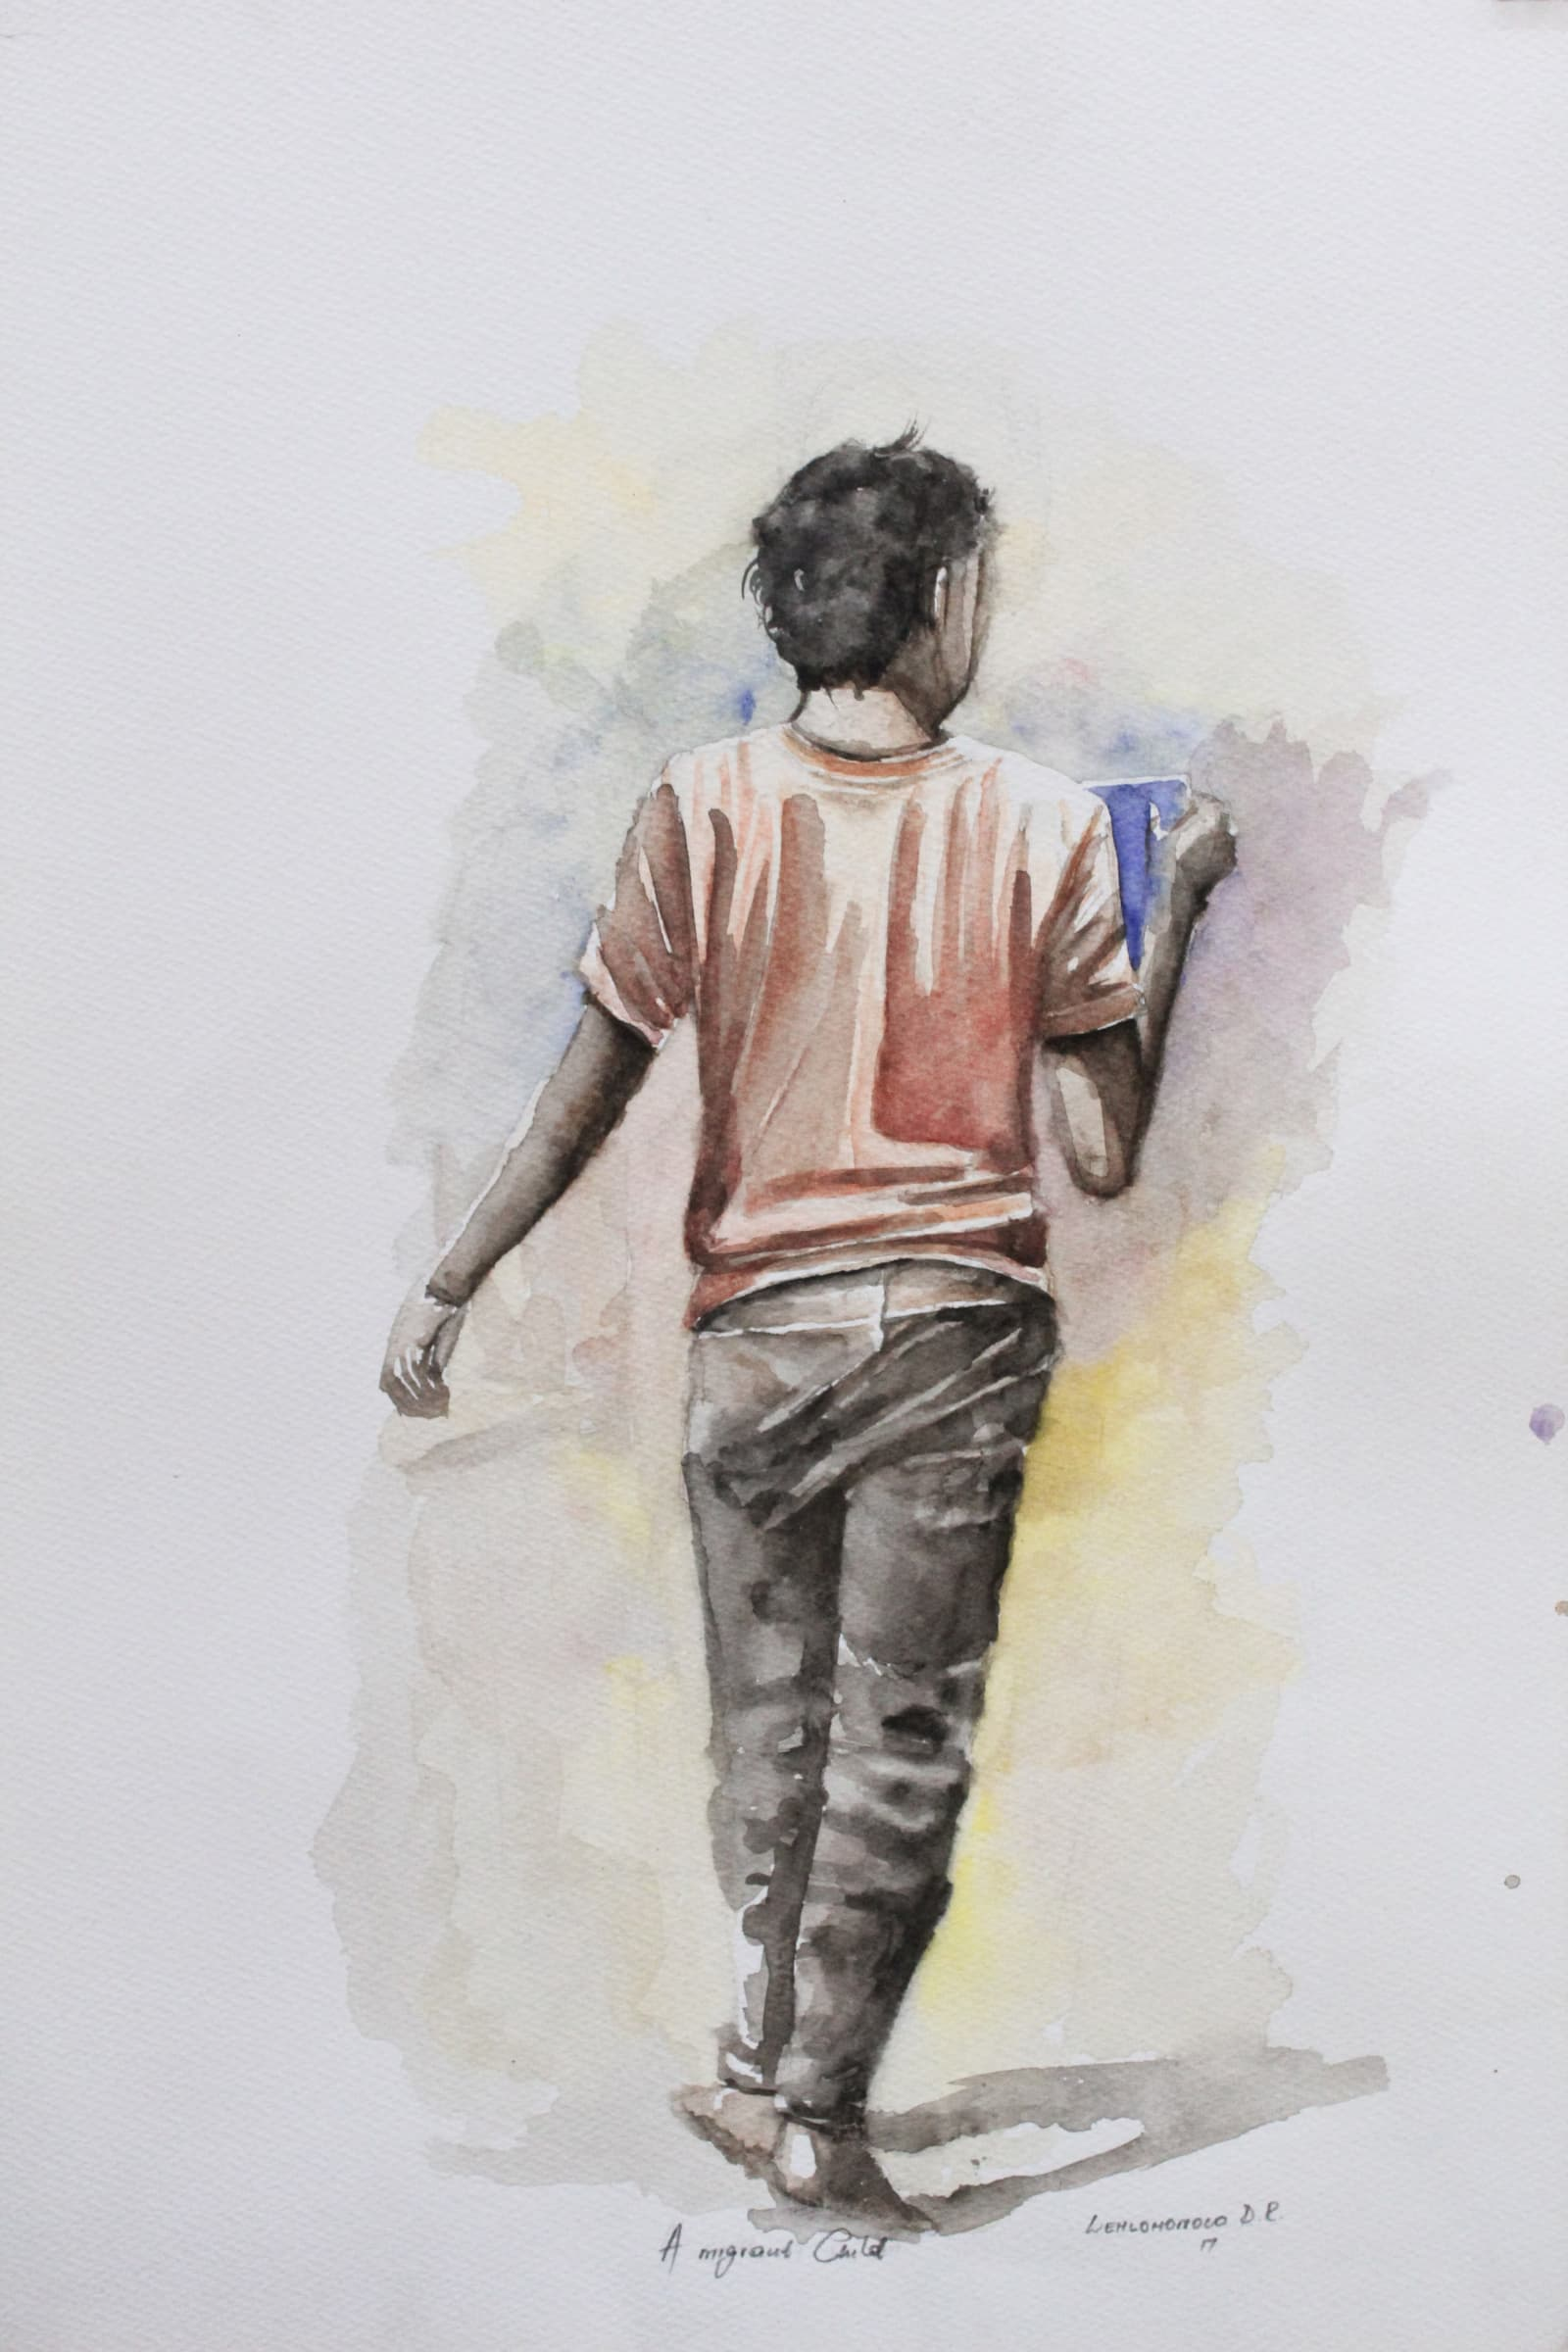 <span class=&#34;link fancybox-details-link&#34;><a href=&#34;/artists/34-lehlohonolo-dhlamini/works/1461-lehlohonolo-dhlamini-a-migrant-child-i-2017/&#34;>View Detail Page</a></span><div class=&#34;artist&#34;><strong>Lehlohonolo Dhlamini</strong></div> <div class=&#34;title&#34;><em>A Migrant Child I</em>, 2017</div> <div class=&#34;medium&#34;>Watercolour On Paper</div> <div class=&#34;dimensions&#34;>55cm x 37.5cm</div><div class=&#34;price&#34;>R4,200.00</div>